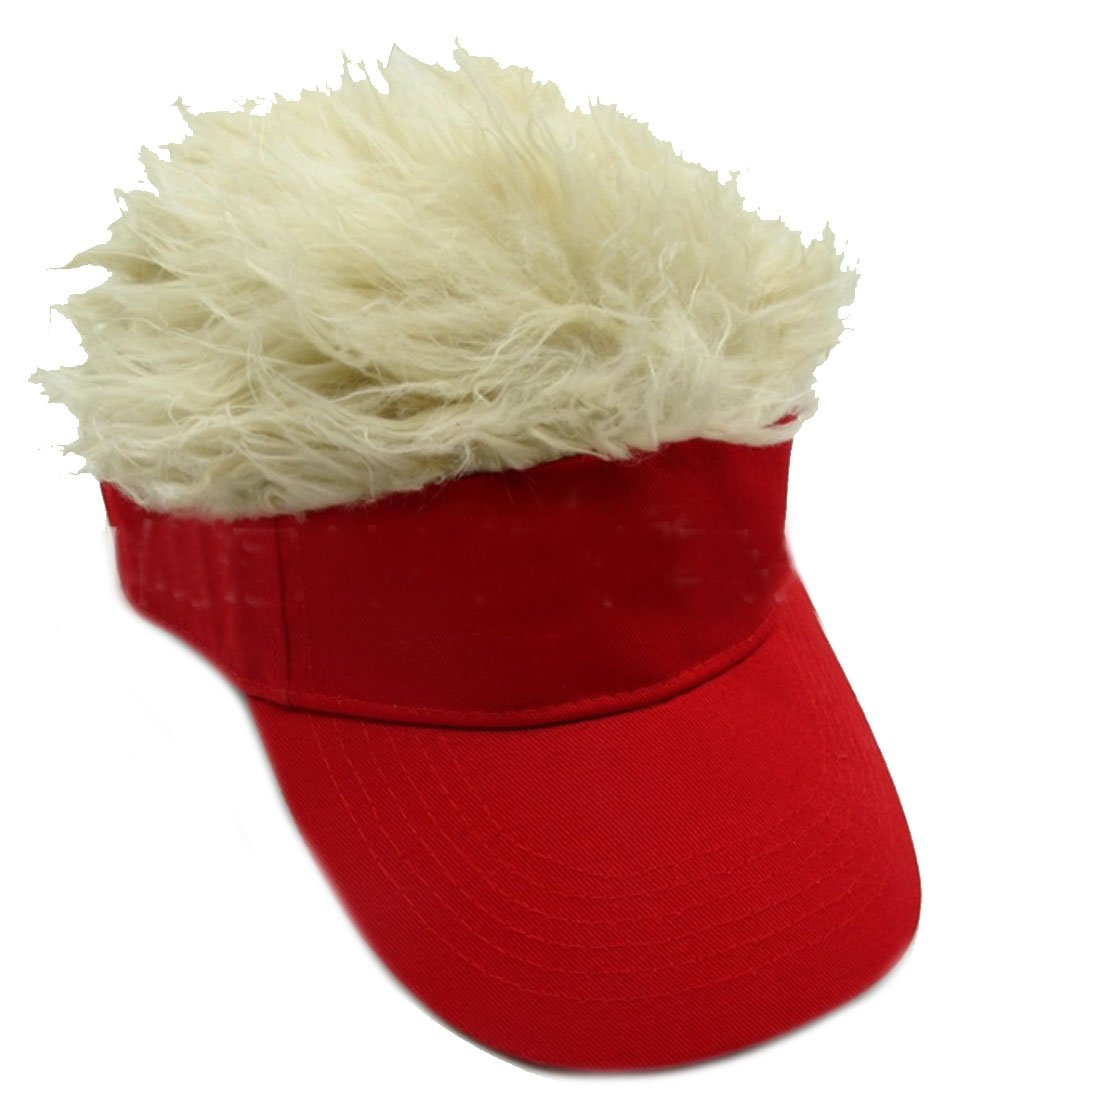 Lerben Funny Sun Visor Cap Wig Peaked Hat Adjustable Baseball Cap SUG-05281